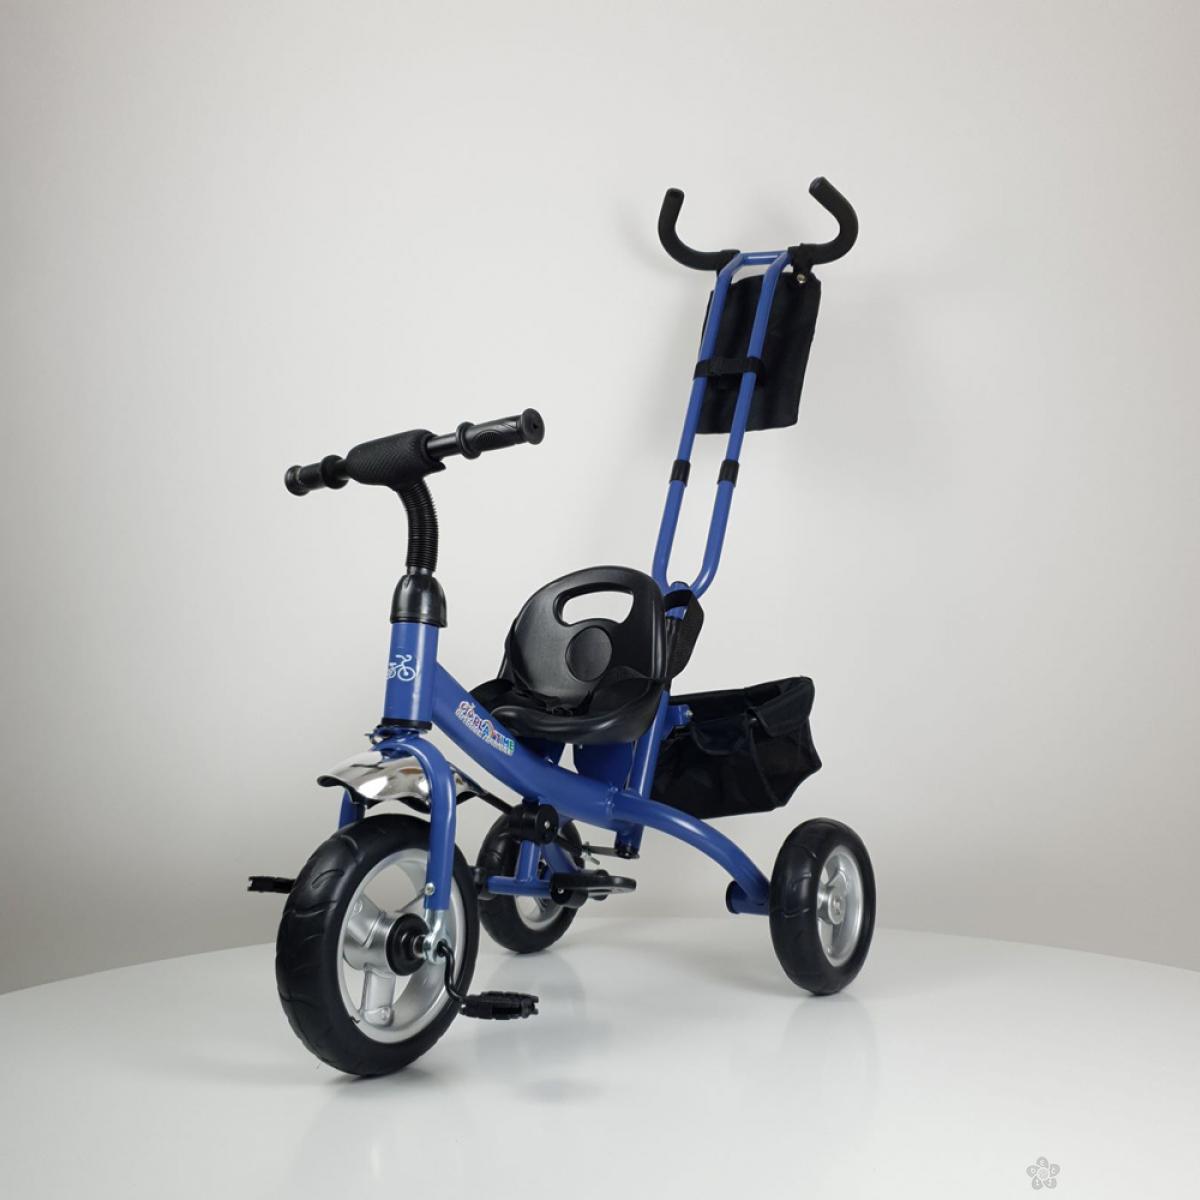 Tricikl bez tende Master model 432 plava